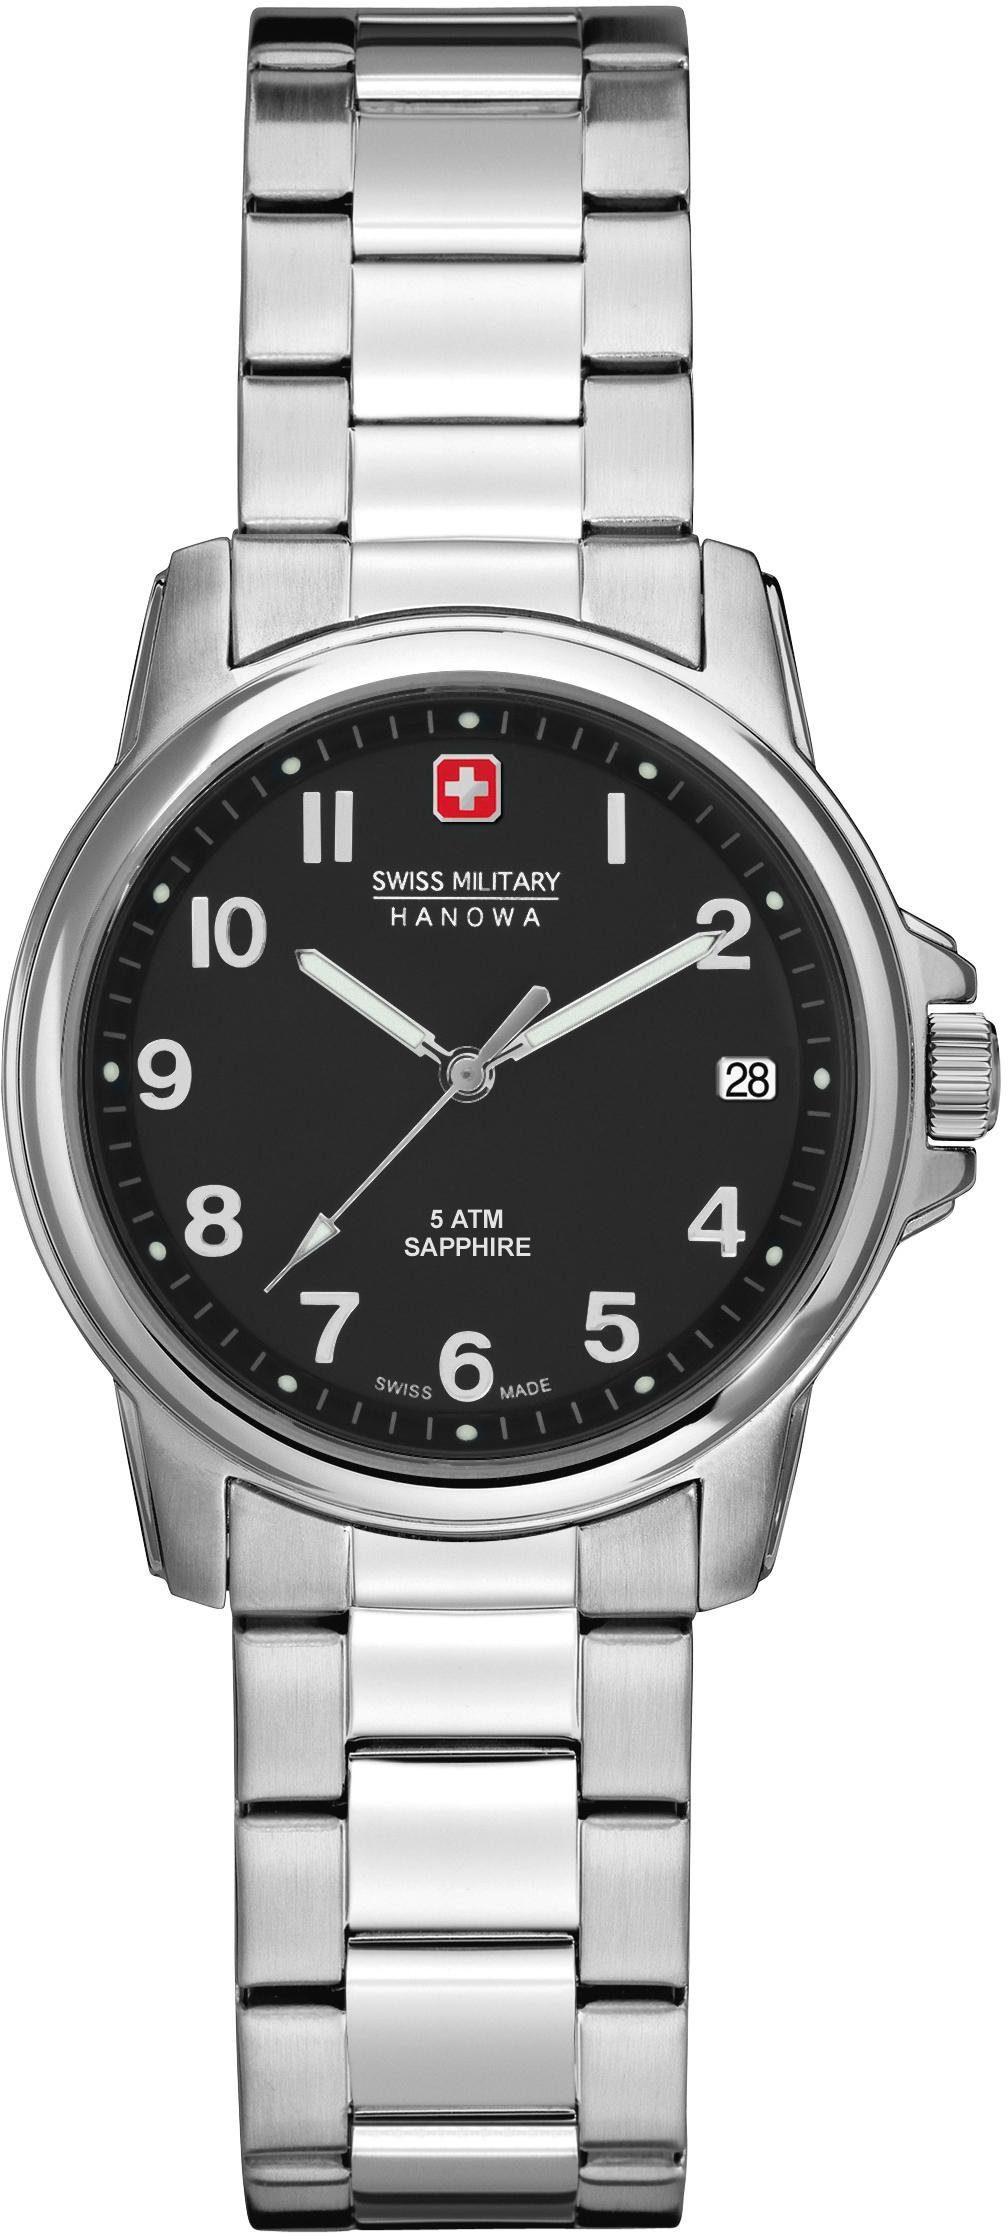 Swiss Military Hanowa Schweizer Uhr »SWISS SOLDIER LADY PRIME, 6-7231.04.007«